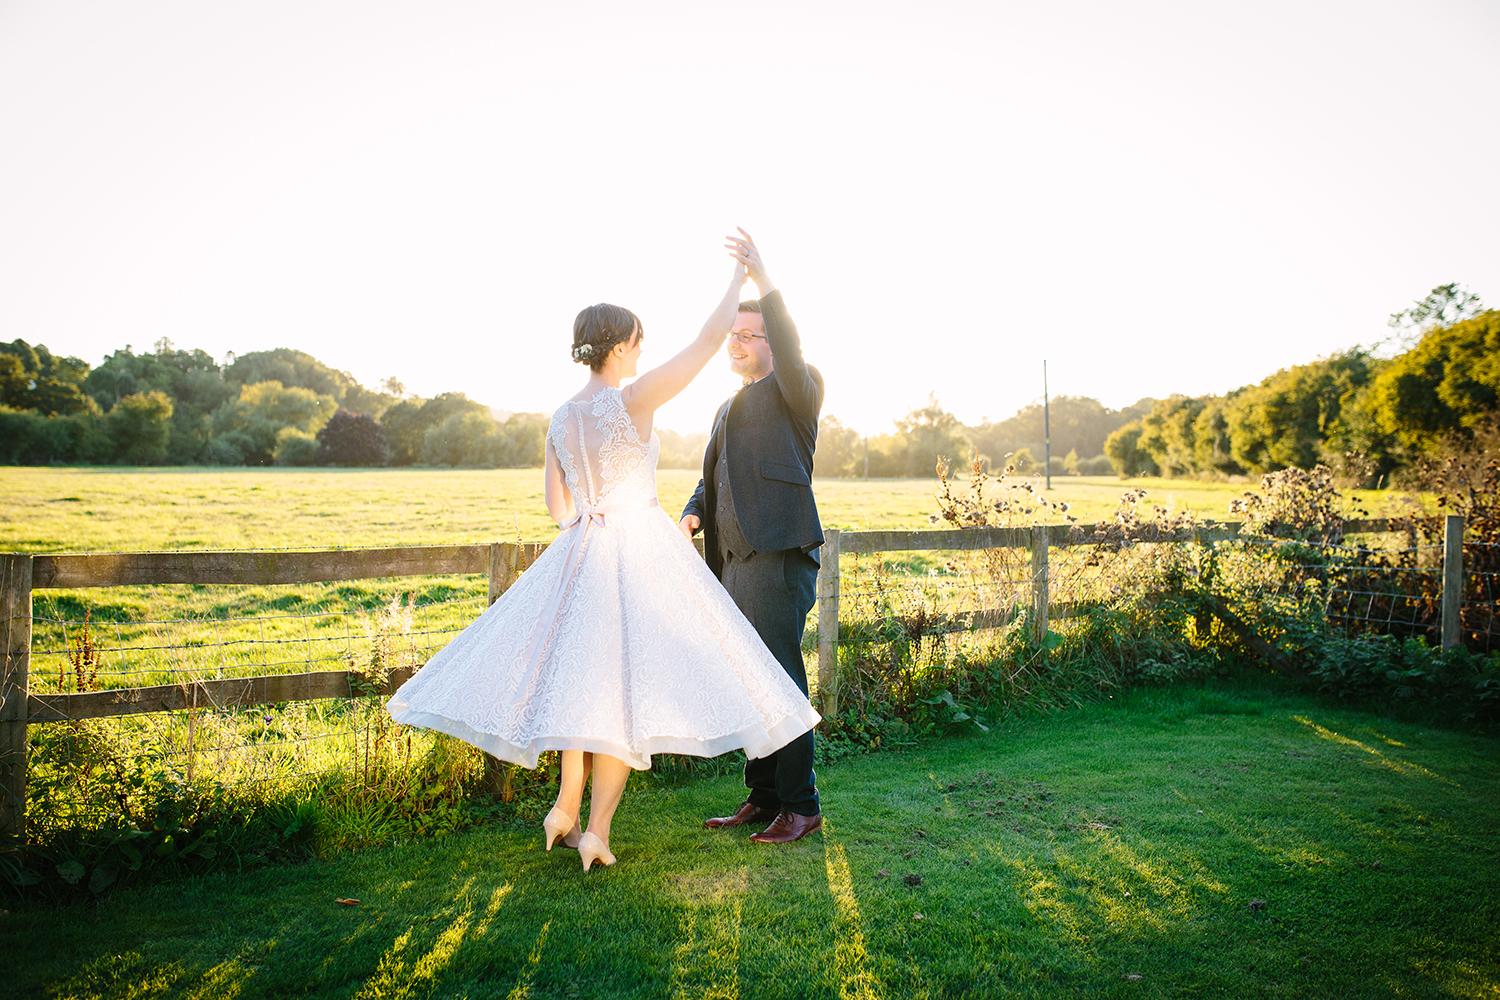 worcester-wedding-photographer-102.jpg